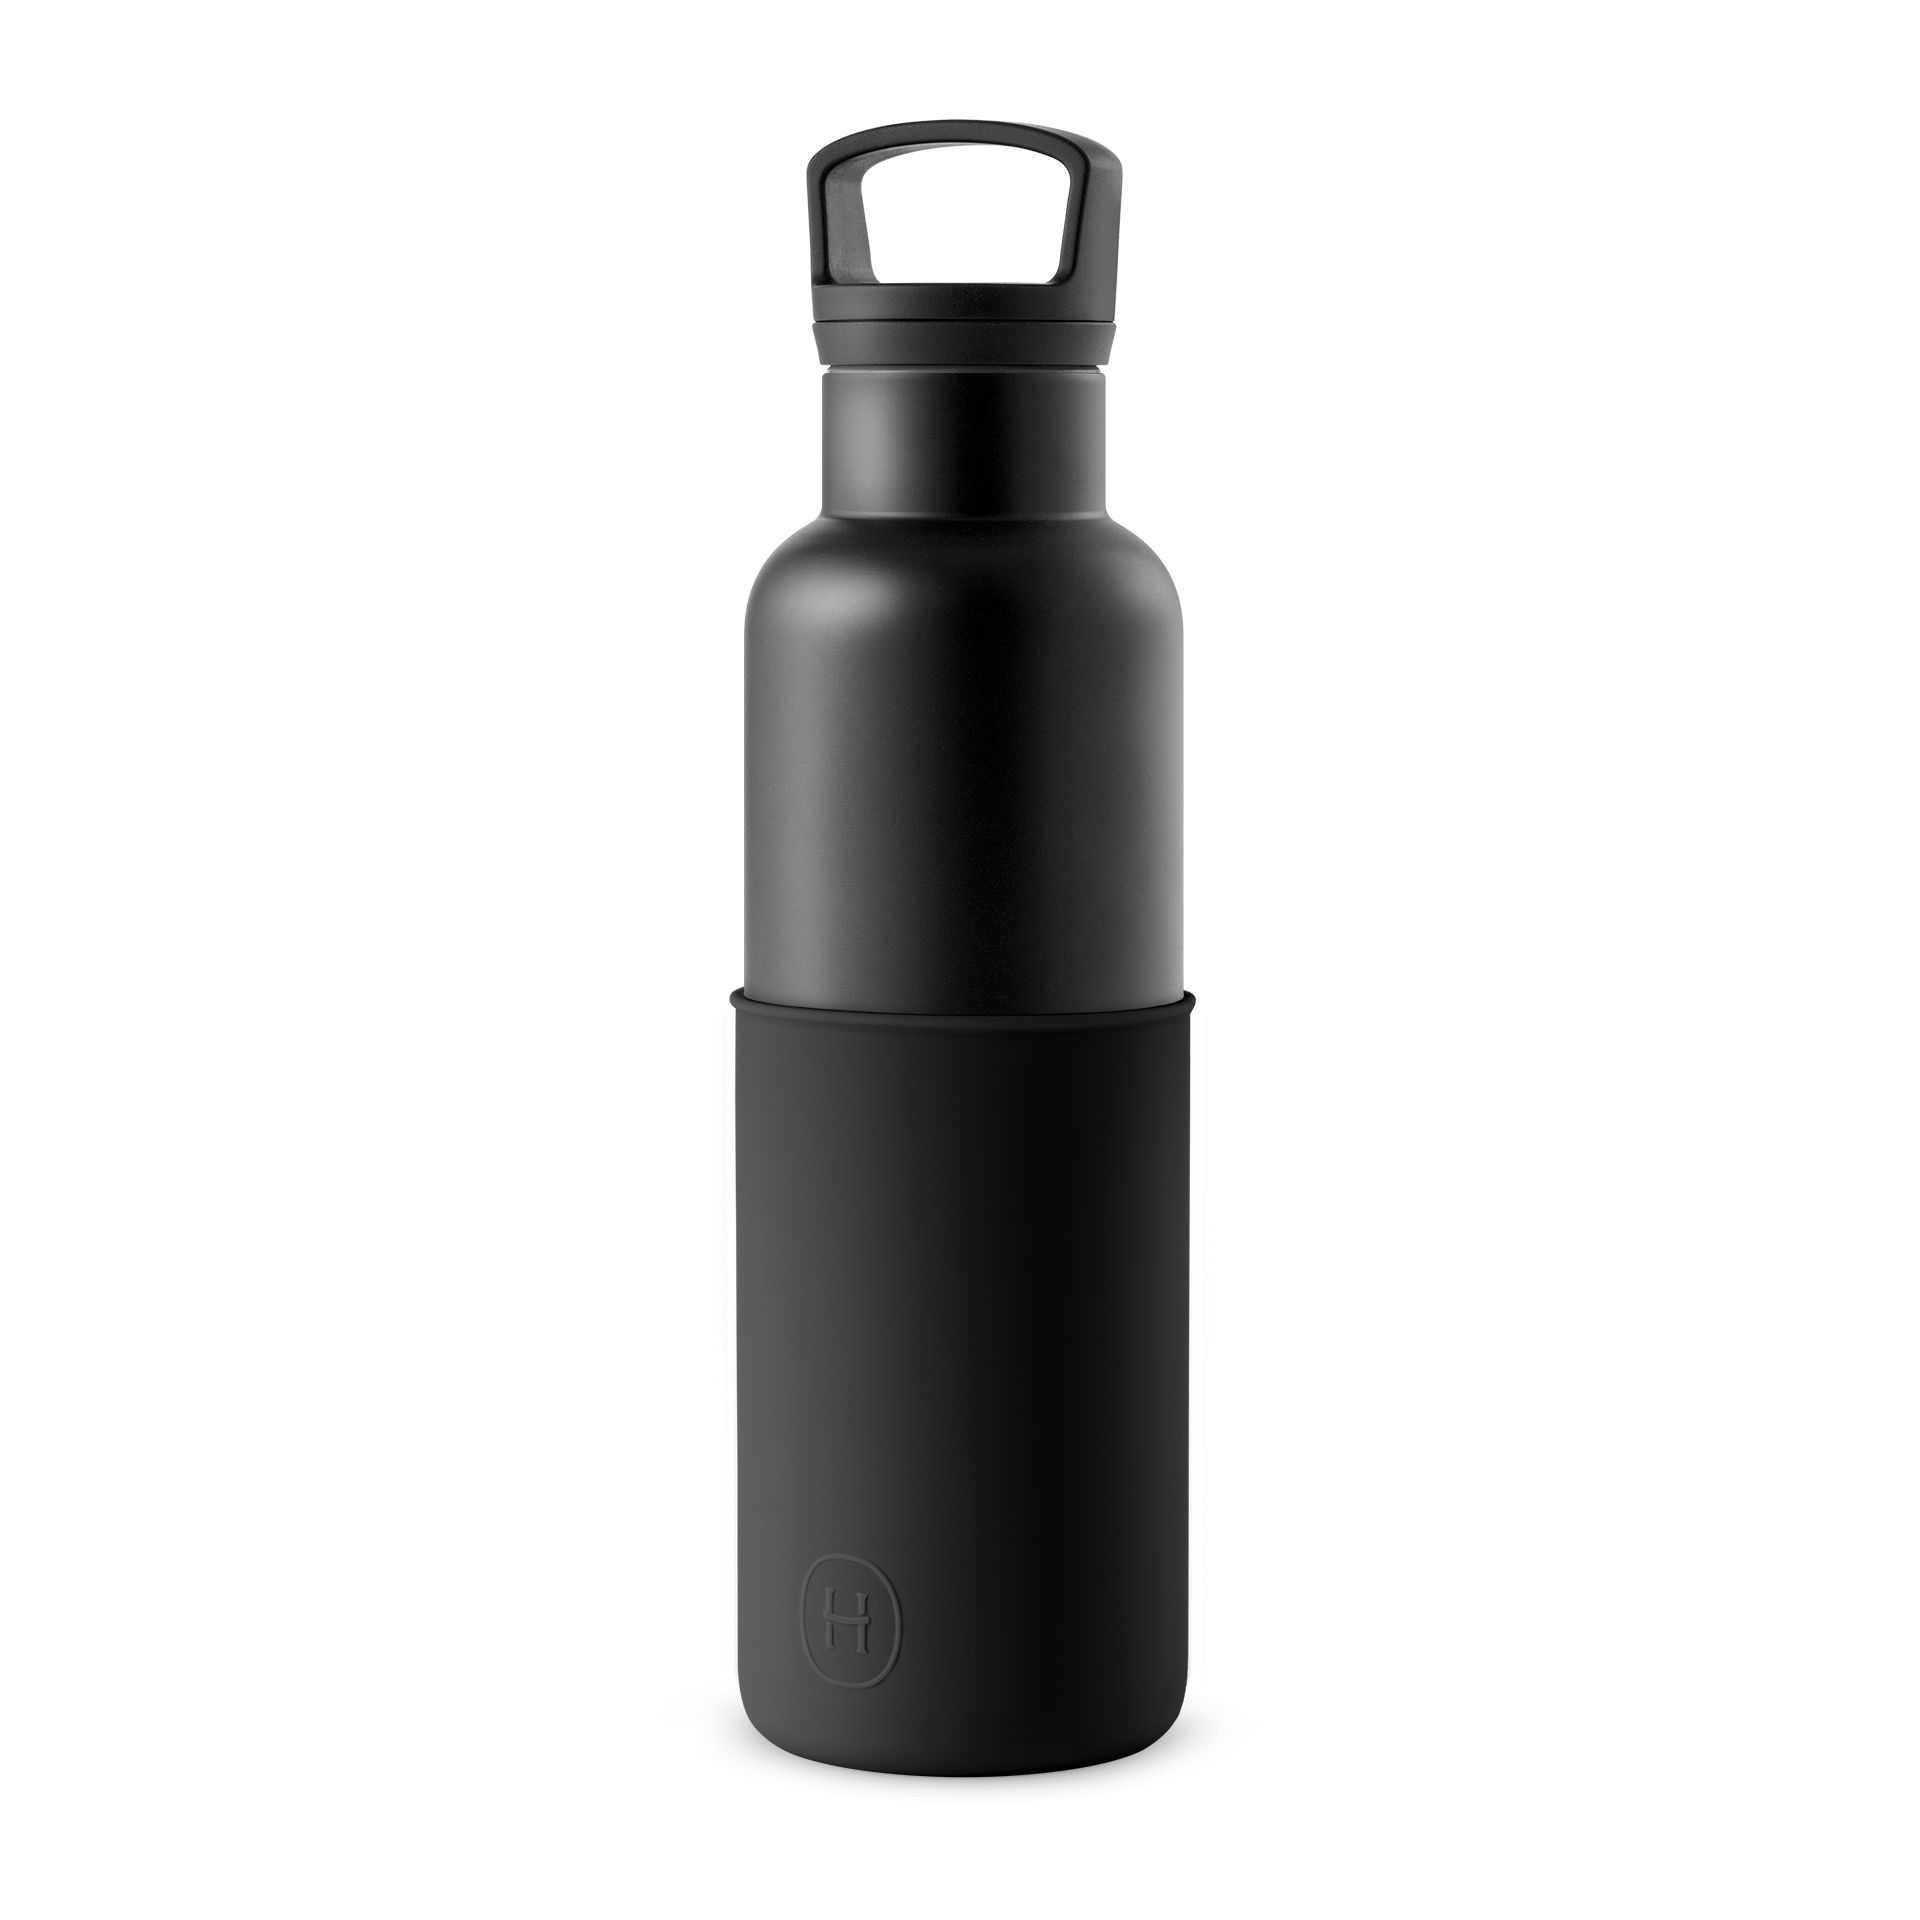 【HYDY】午夜黑-黑瓶 590ml